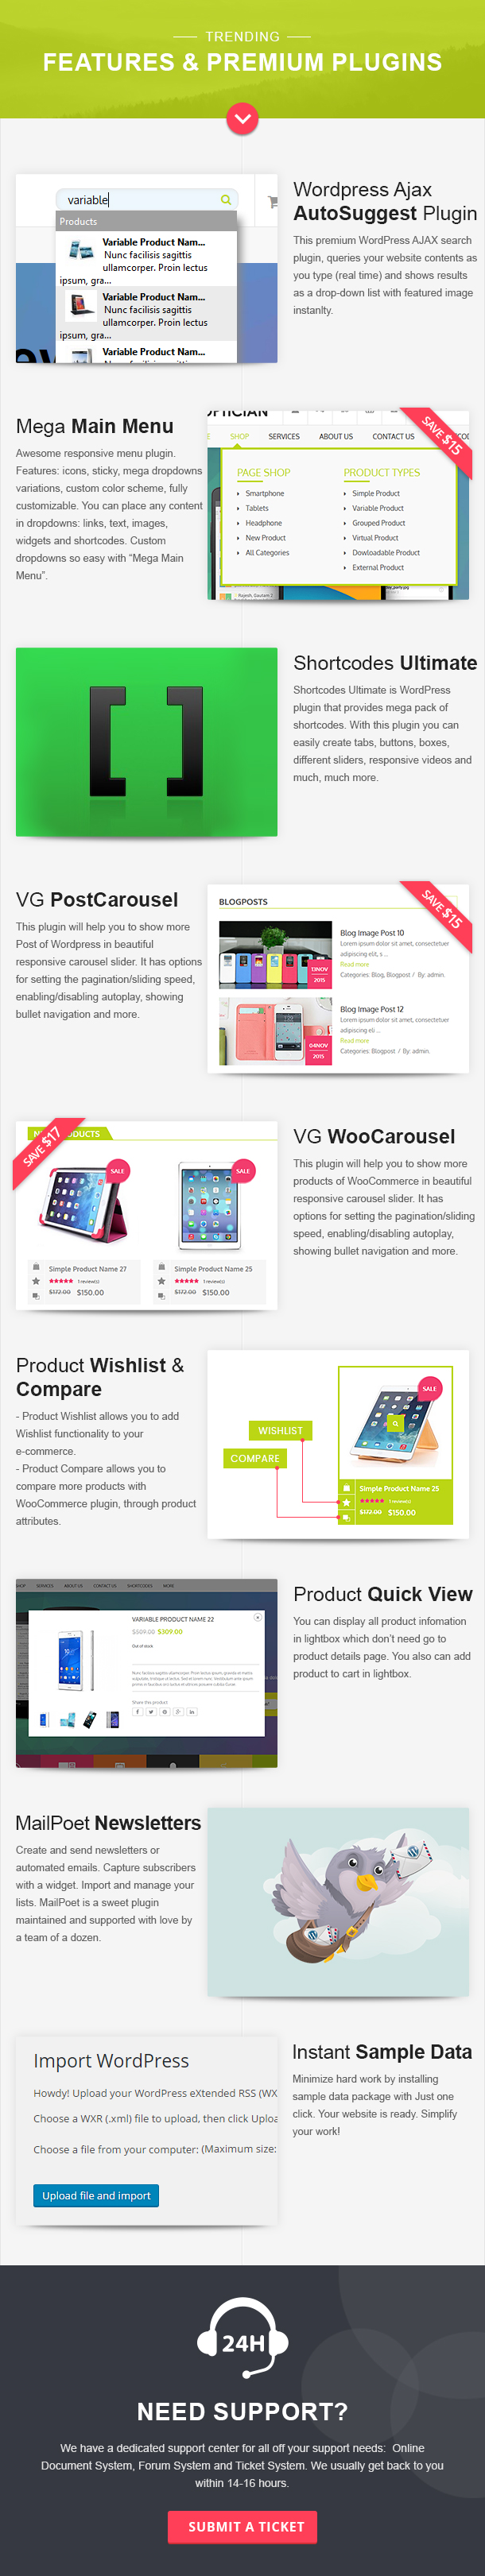 VG Optician - Responsive eCommerce WordPress Theme - 16